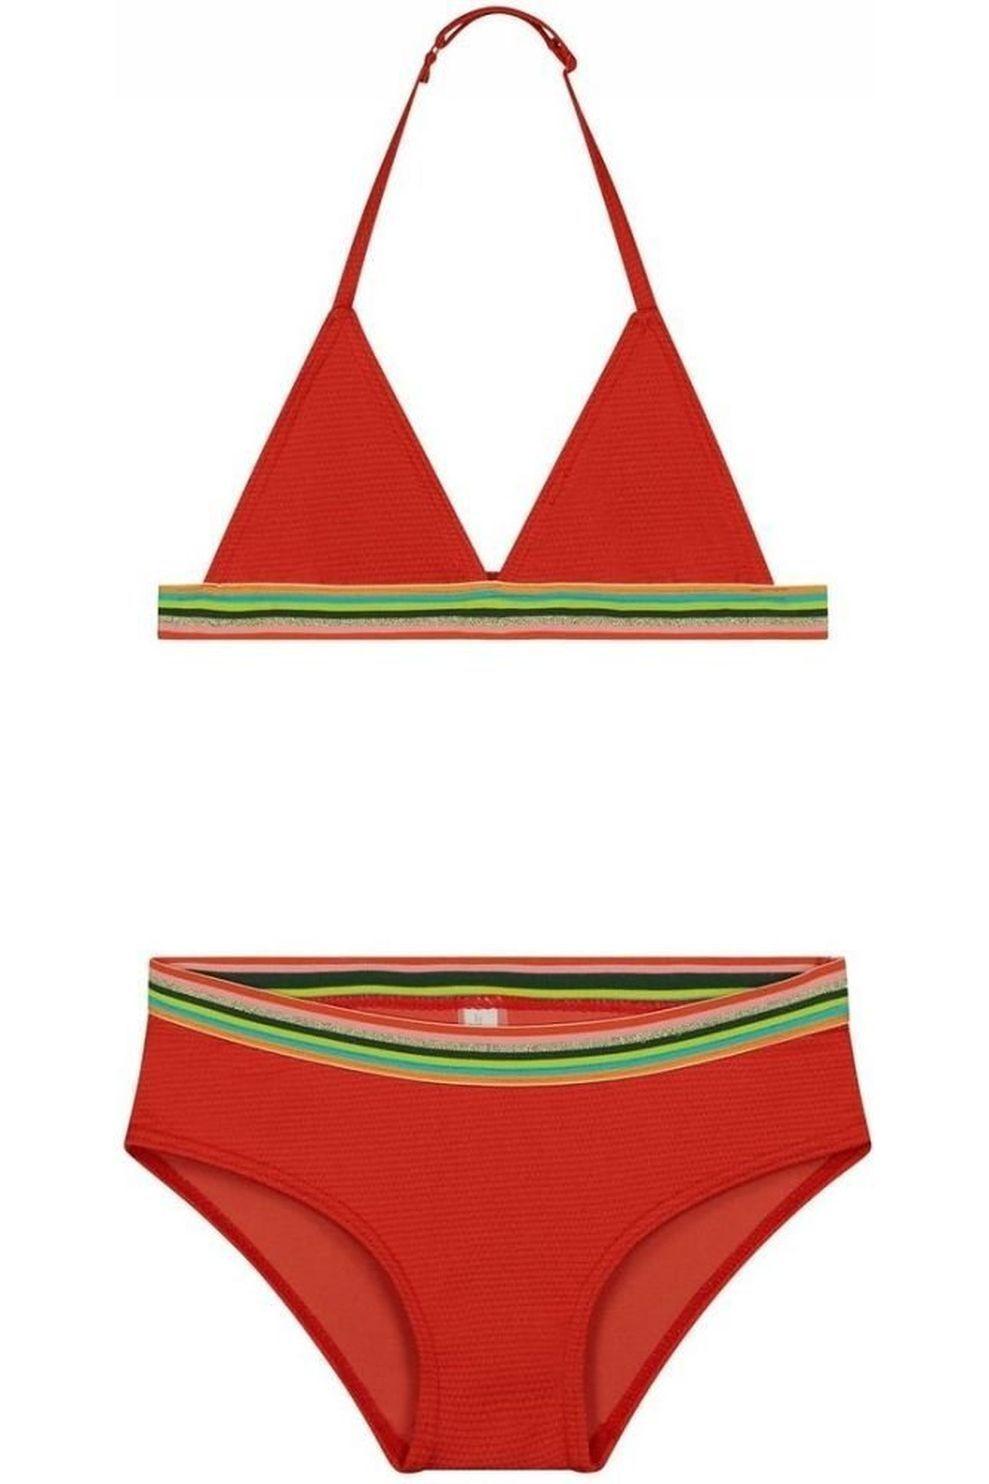 Shiwi Bikini Rainbow Triangle voor meisjes - Oranje - Maten: 152, 176